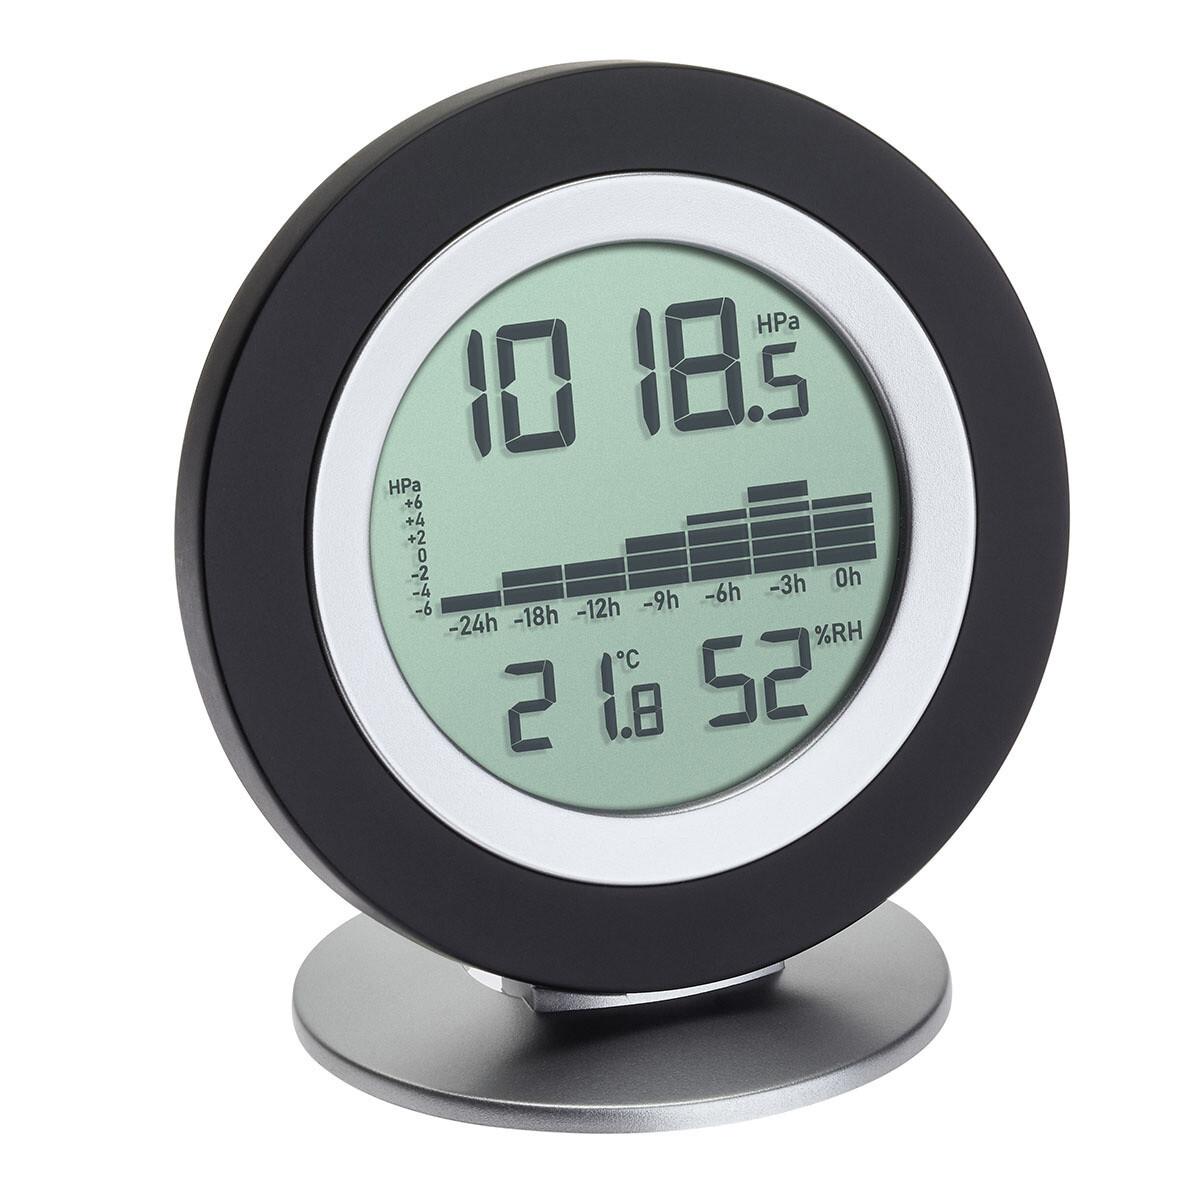 Digitales Barometer-Thermometer-Hygrometer